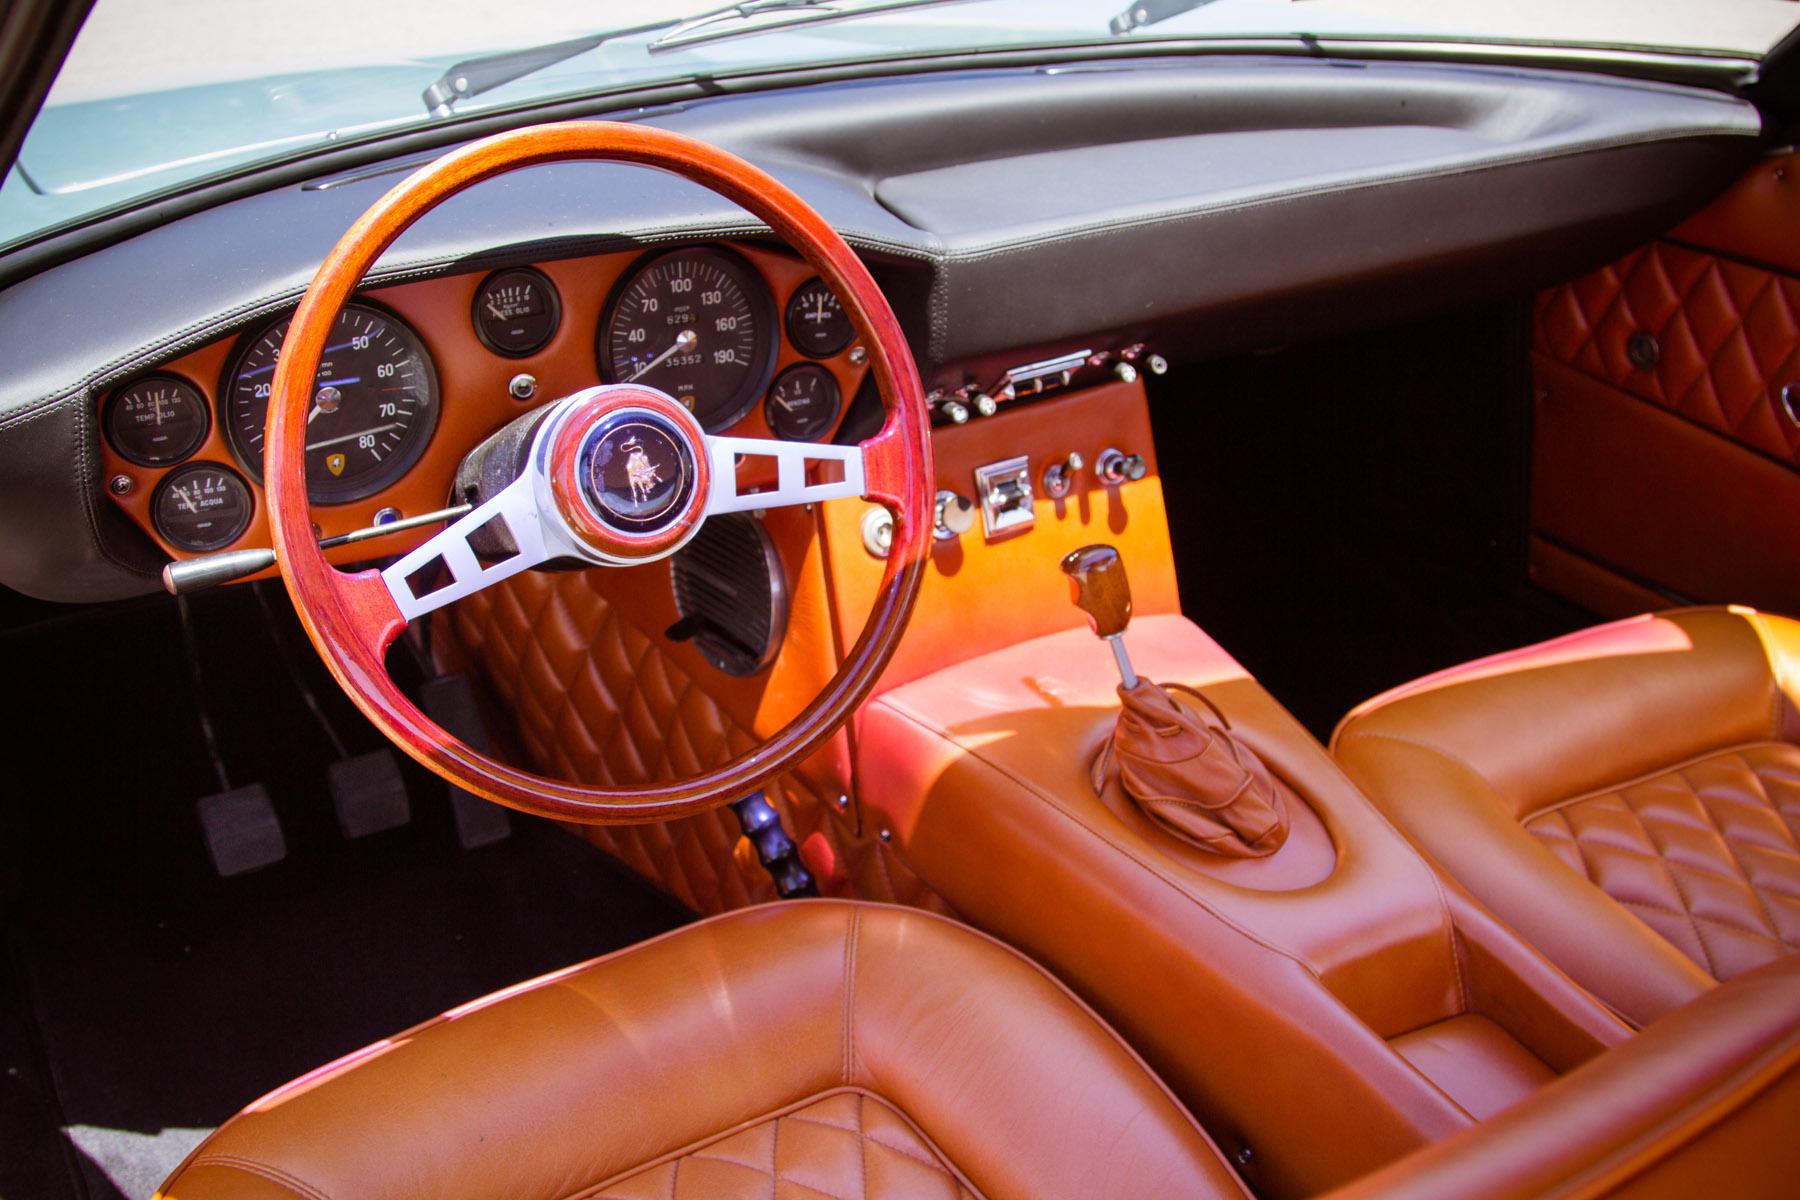 At Gooding & Company, (like buttah), 1968 Lamborghini Islero